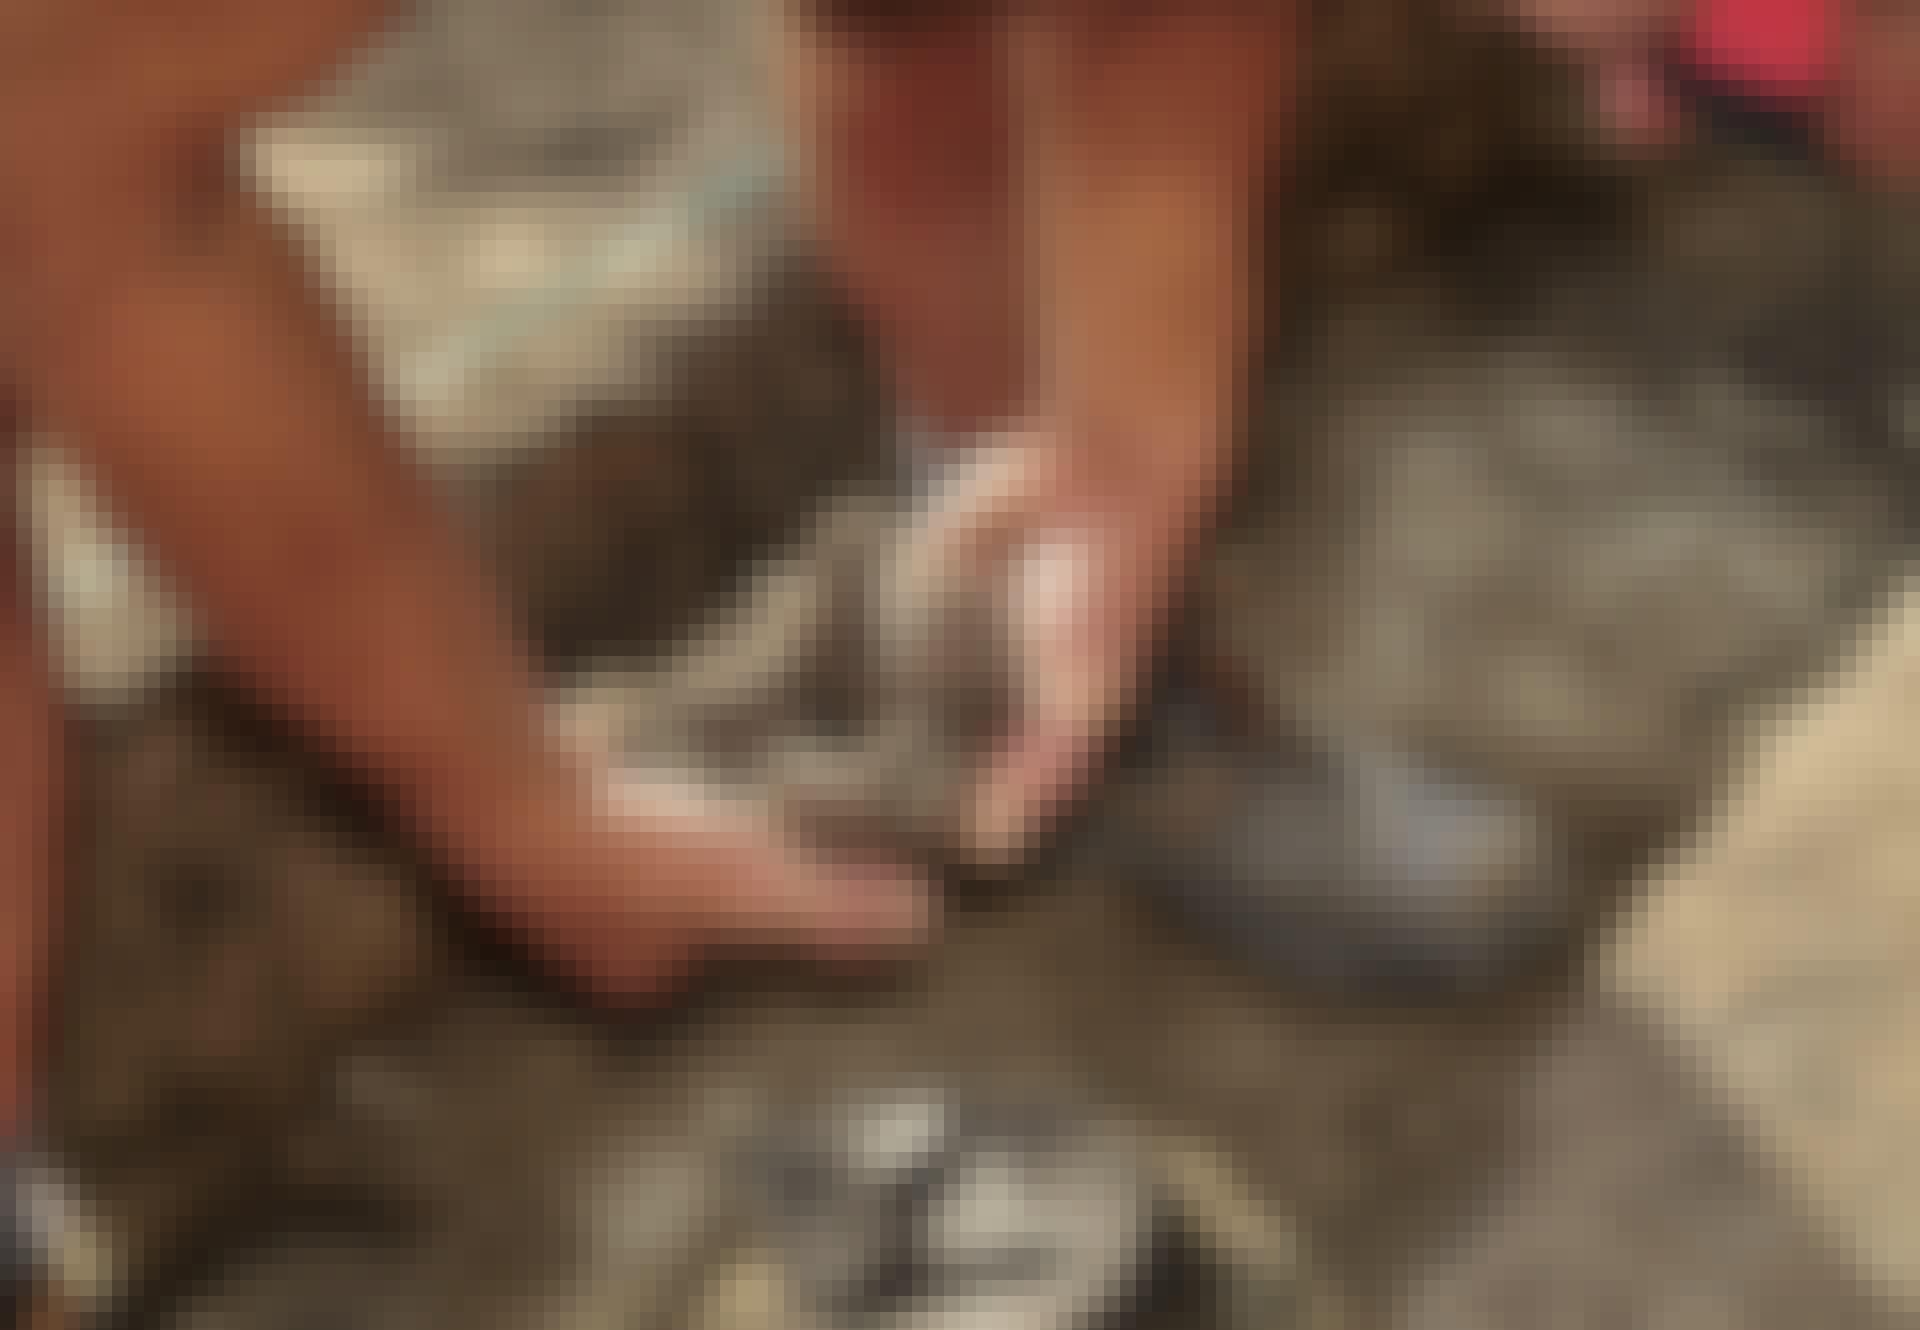 Keramik krukker datering arkæolog